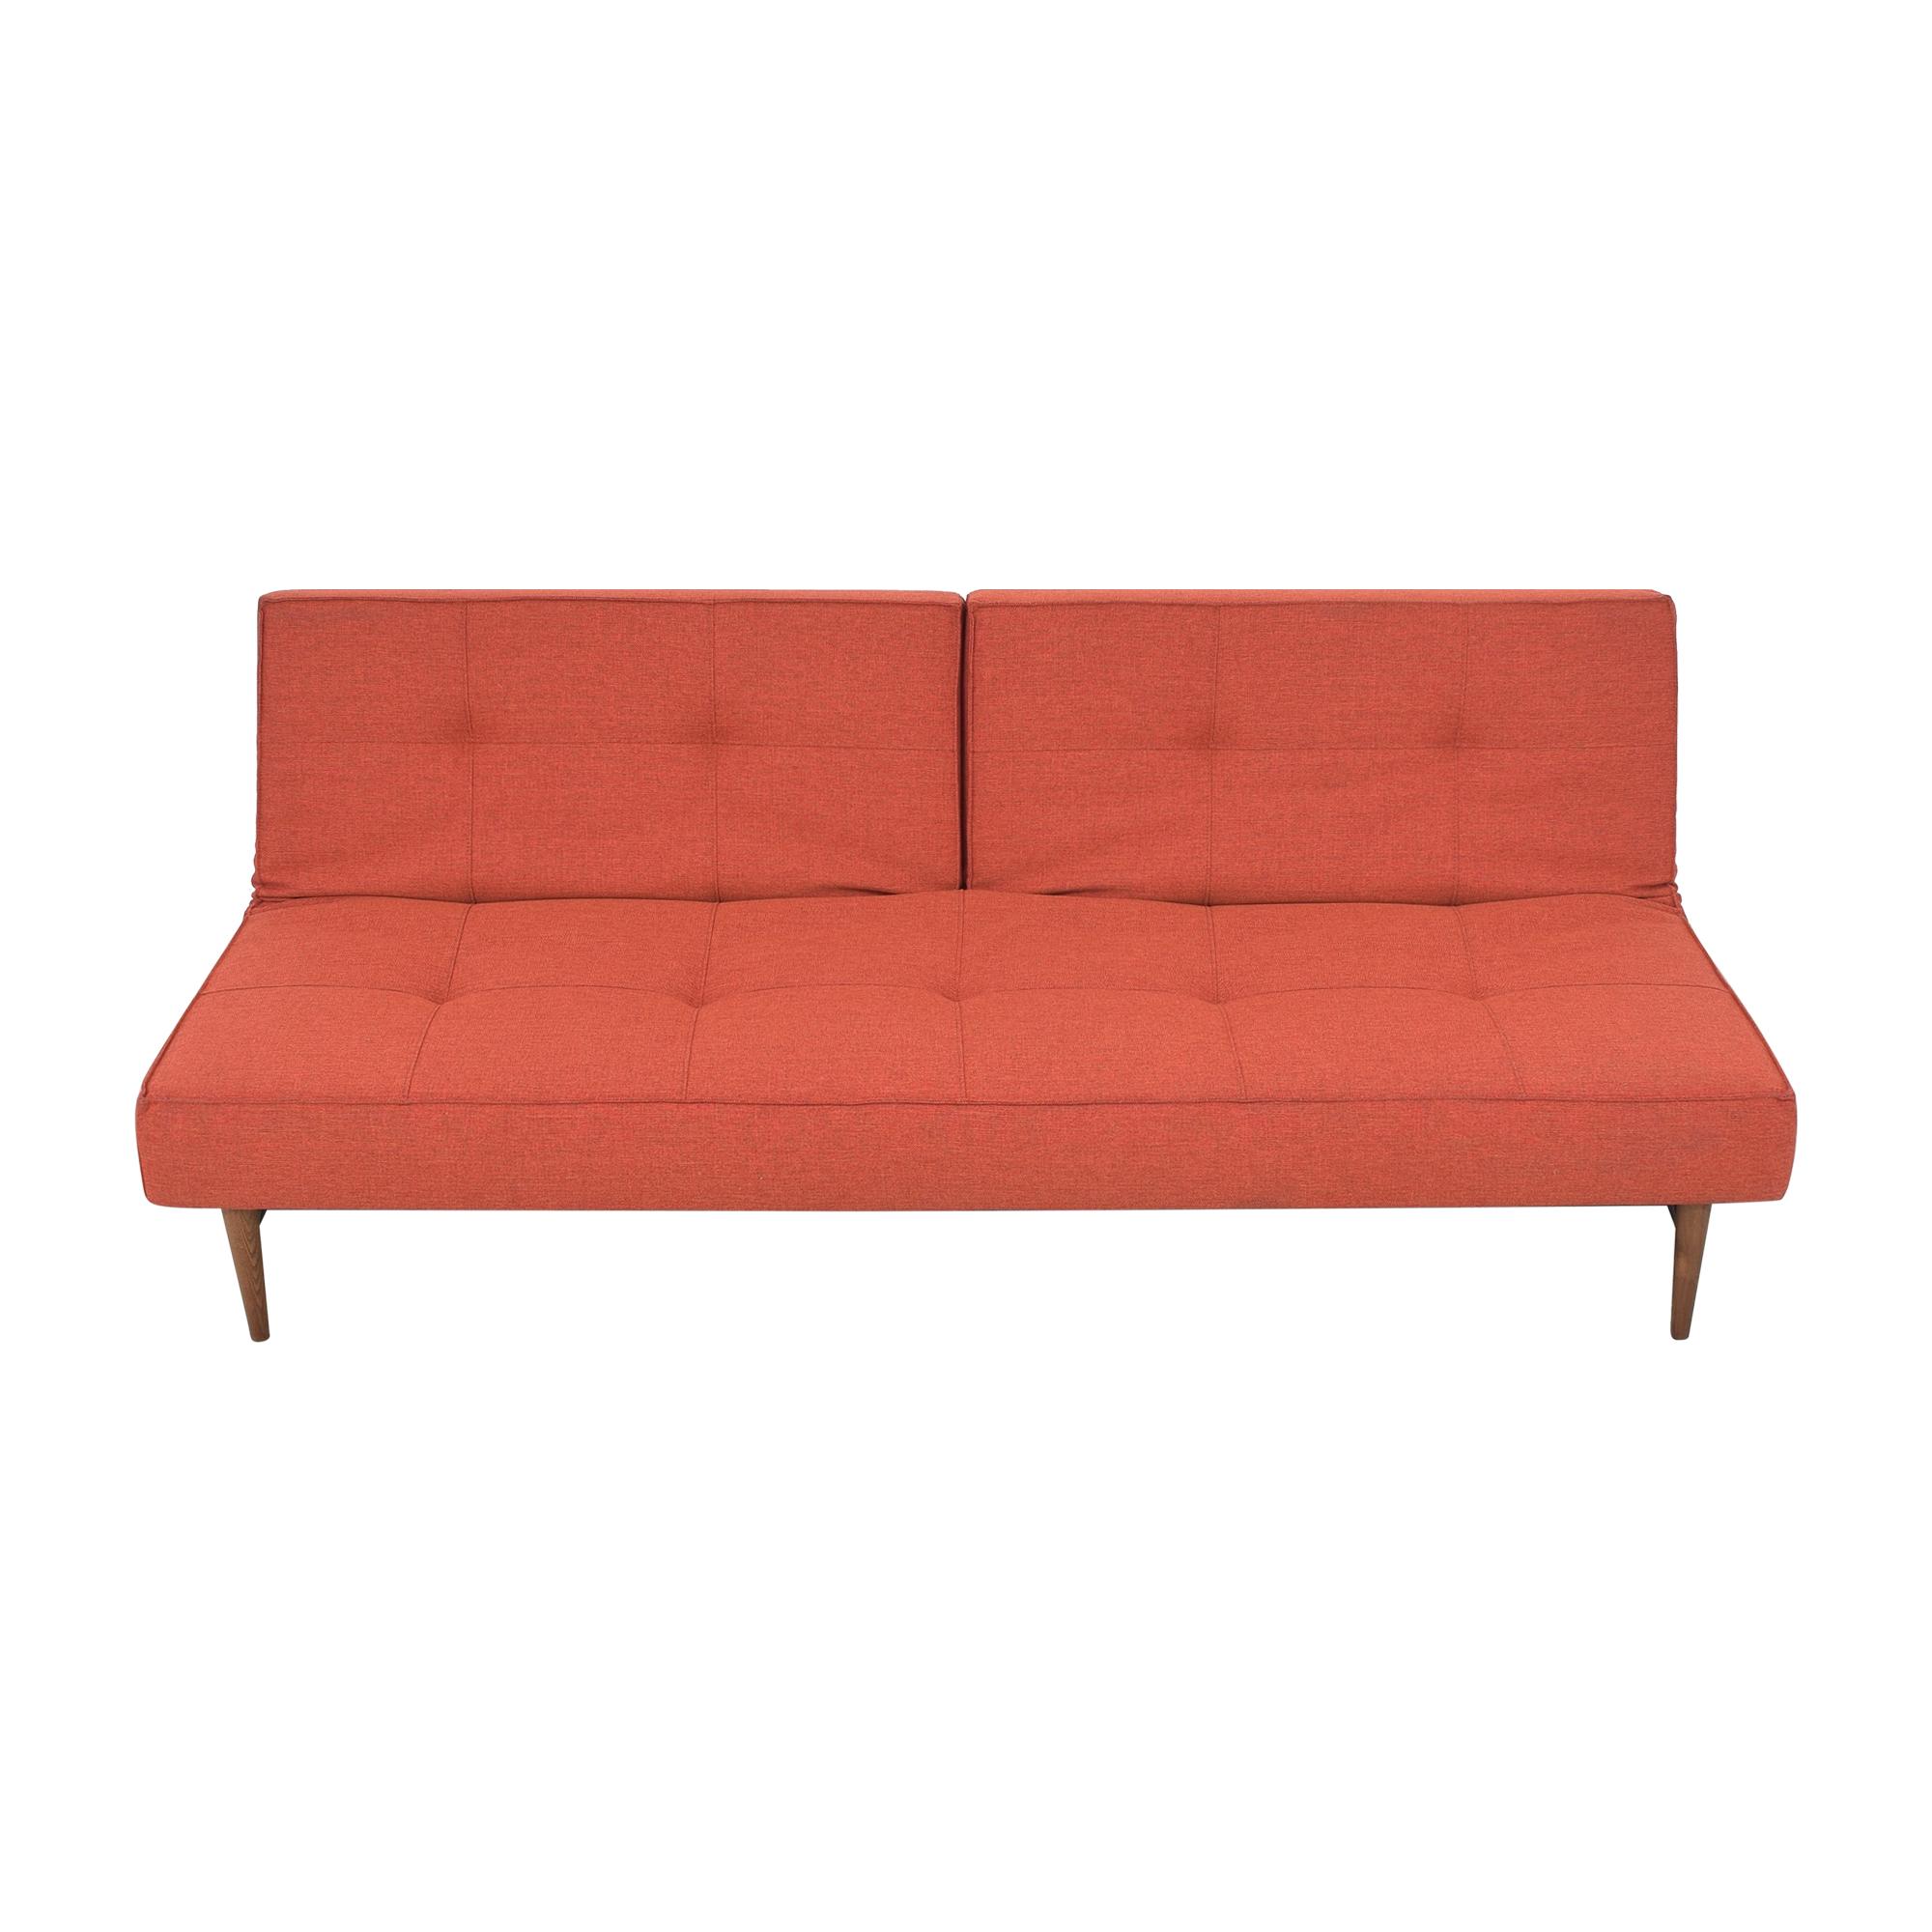 buy Innovation Living Splitback Convertible Sofa Bed Innovation Living